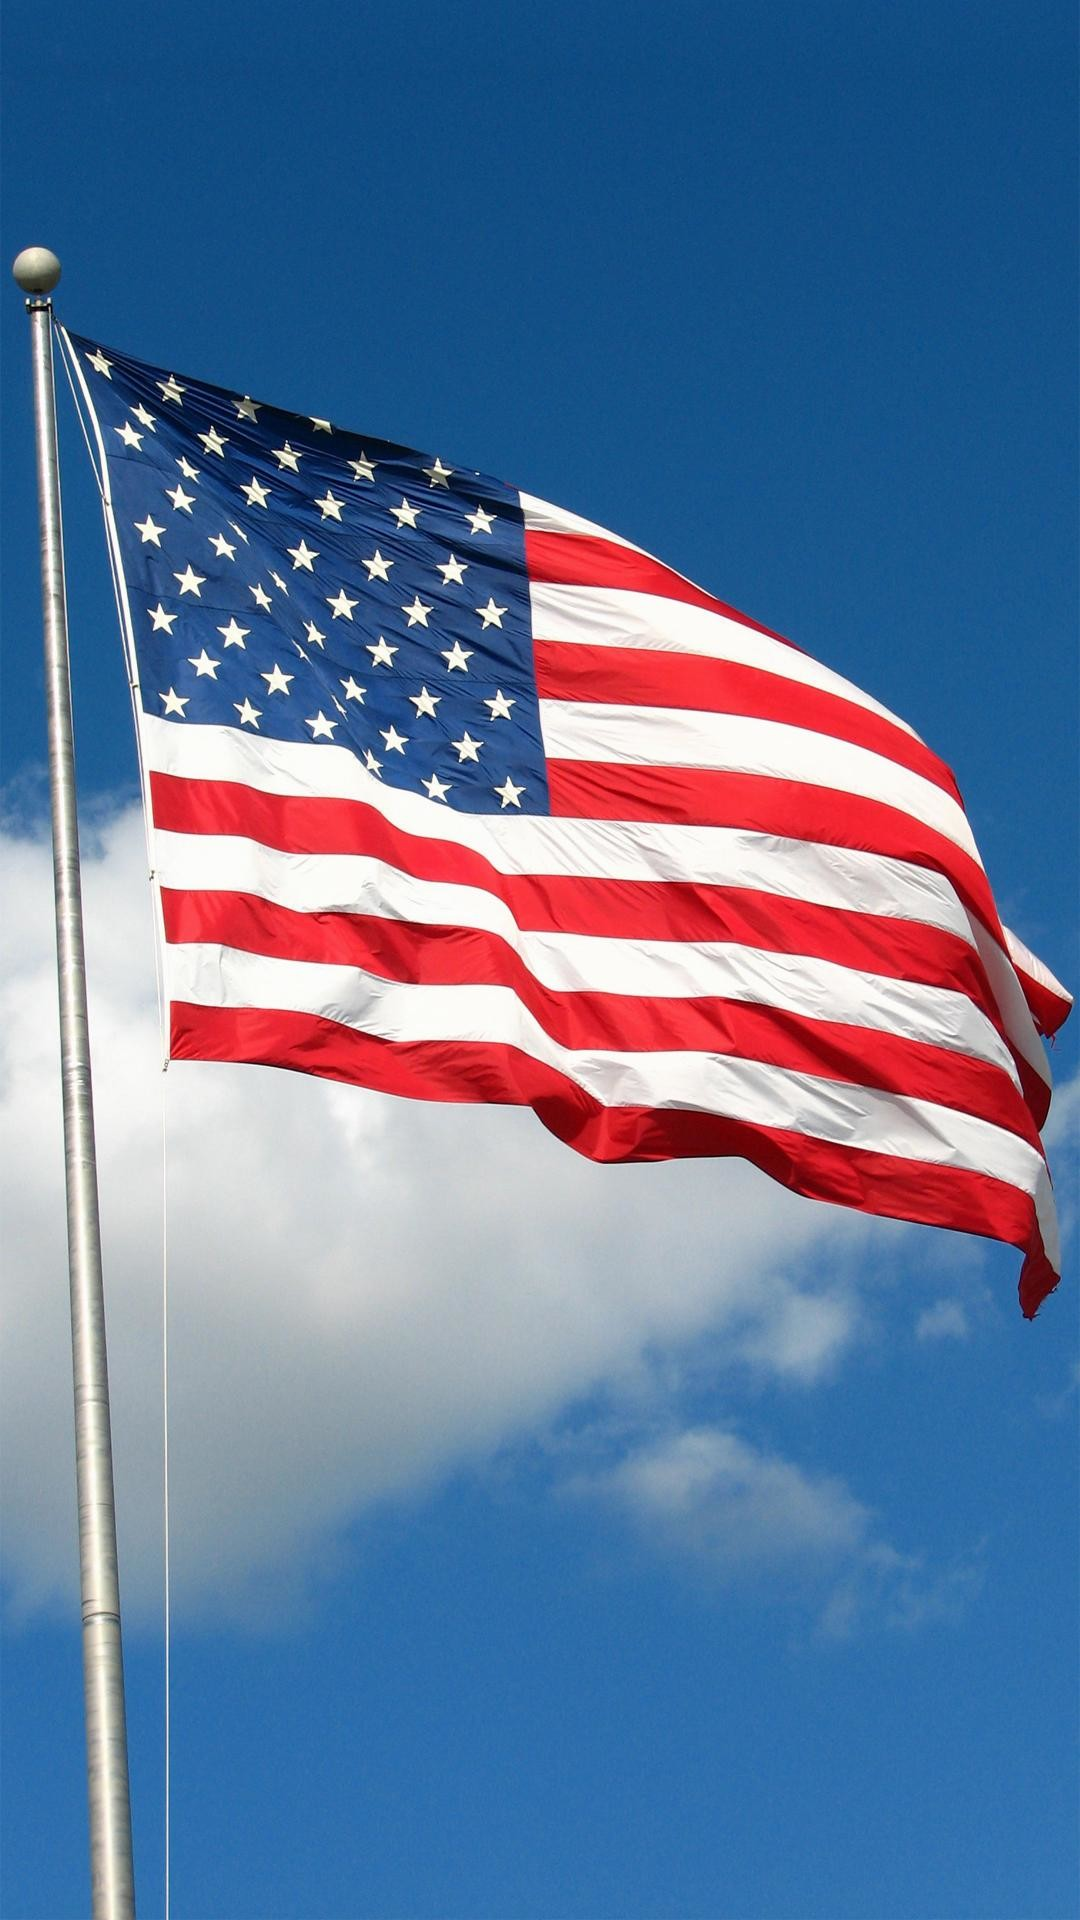 wallpaper.wiki-Download-American-Flag-Iphone-Wallpaper-Free-